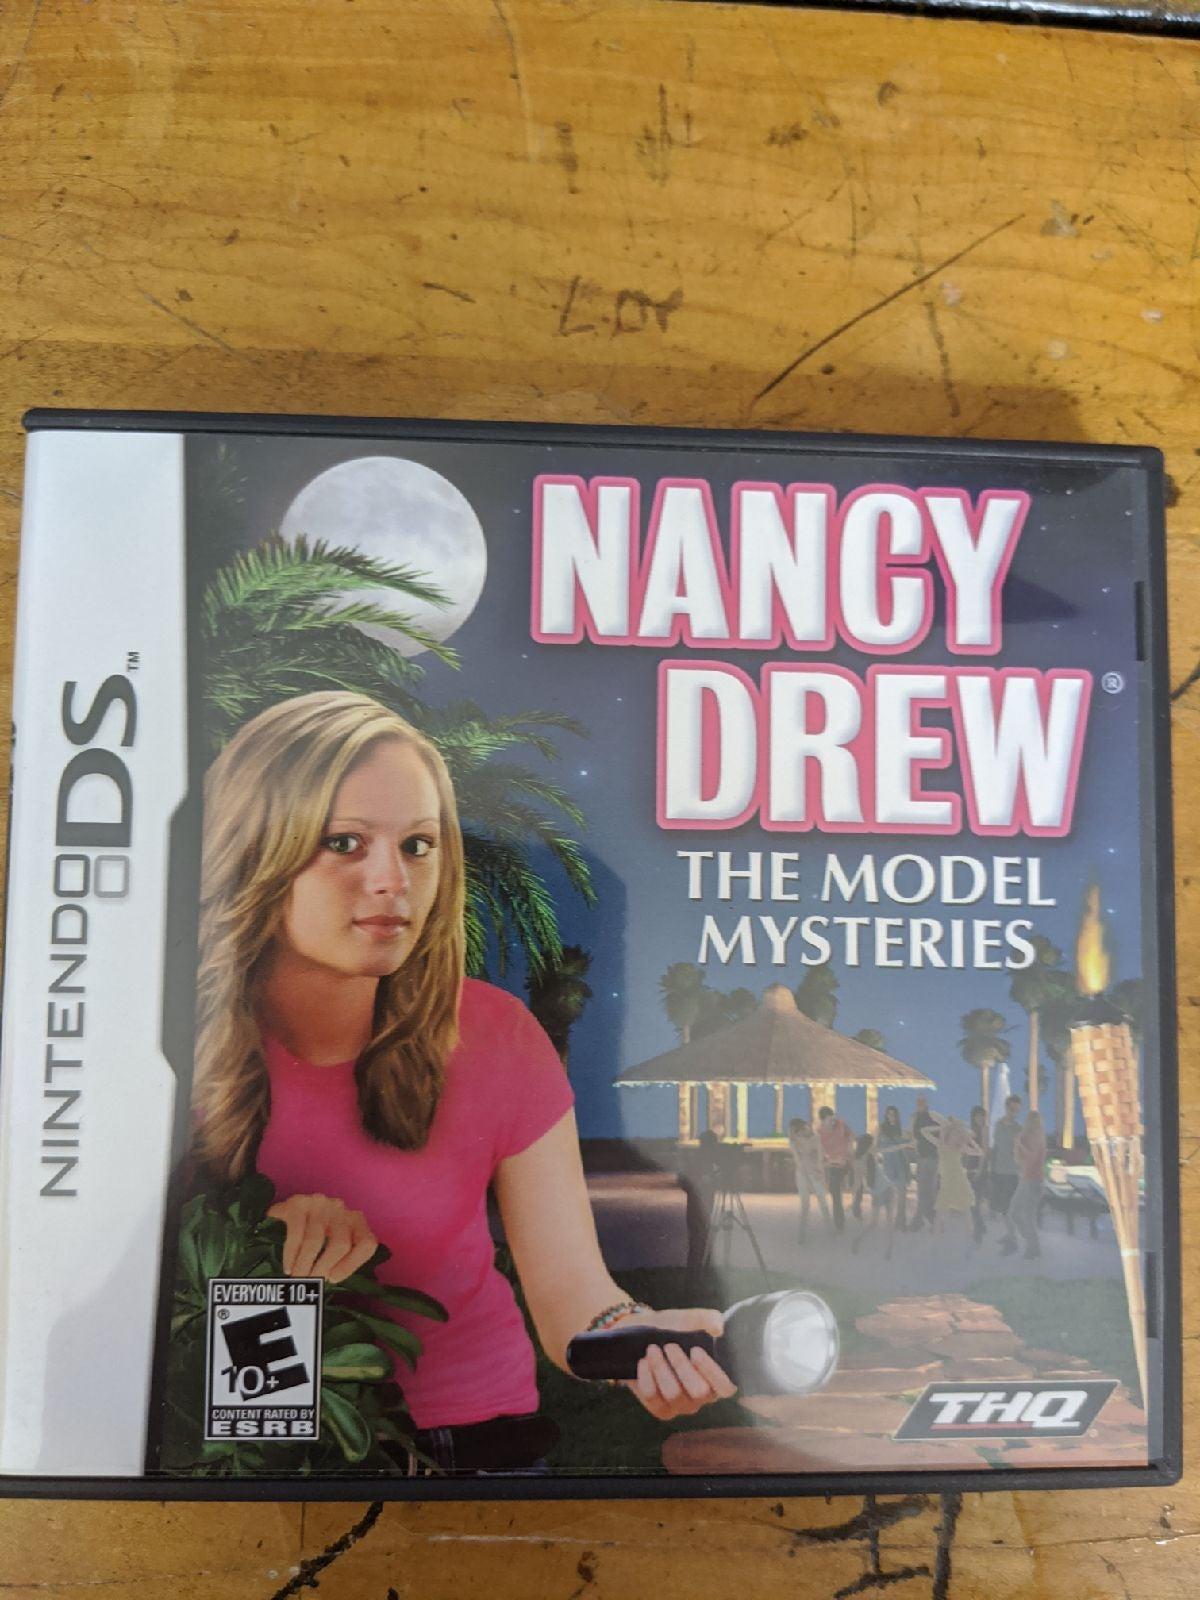 Nancy Drew: The Model Mysteries on Ninte